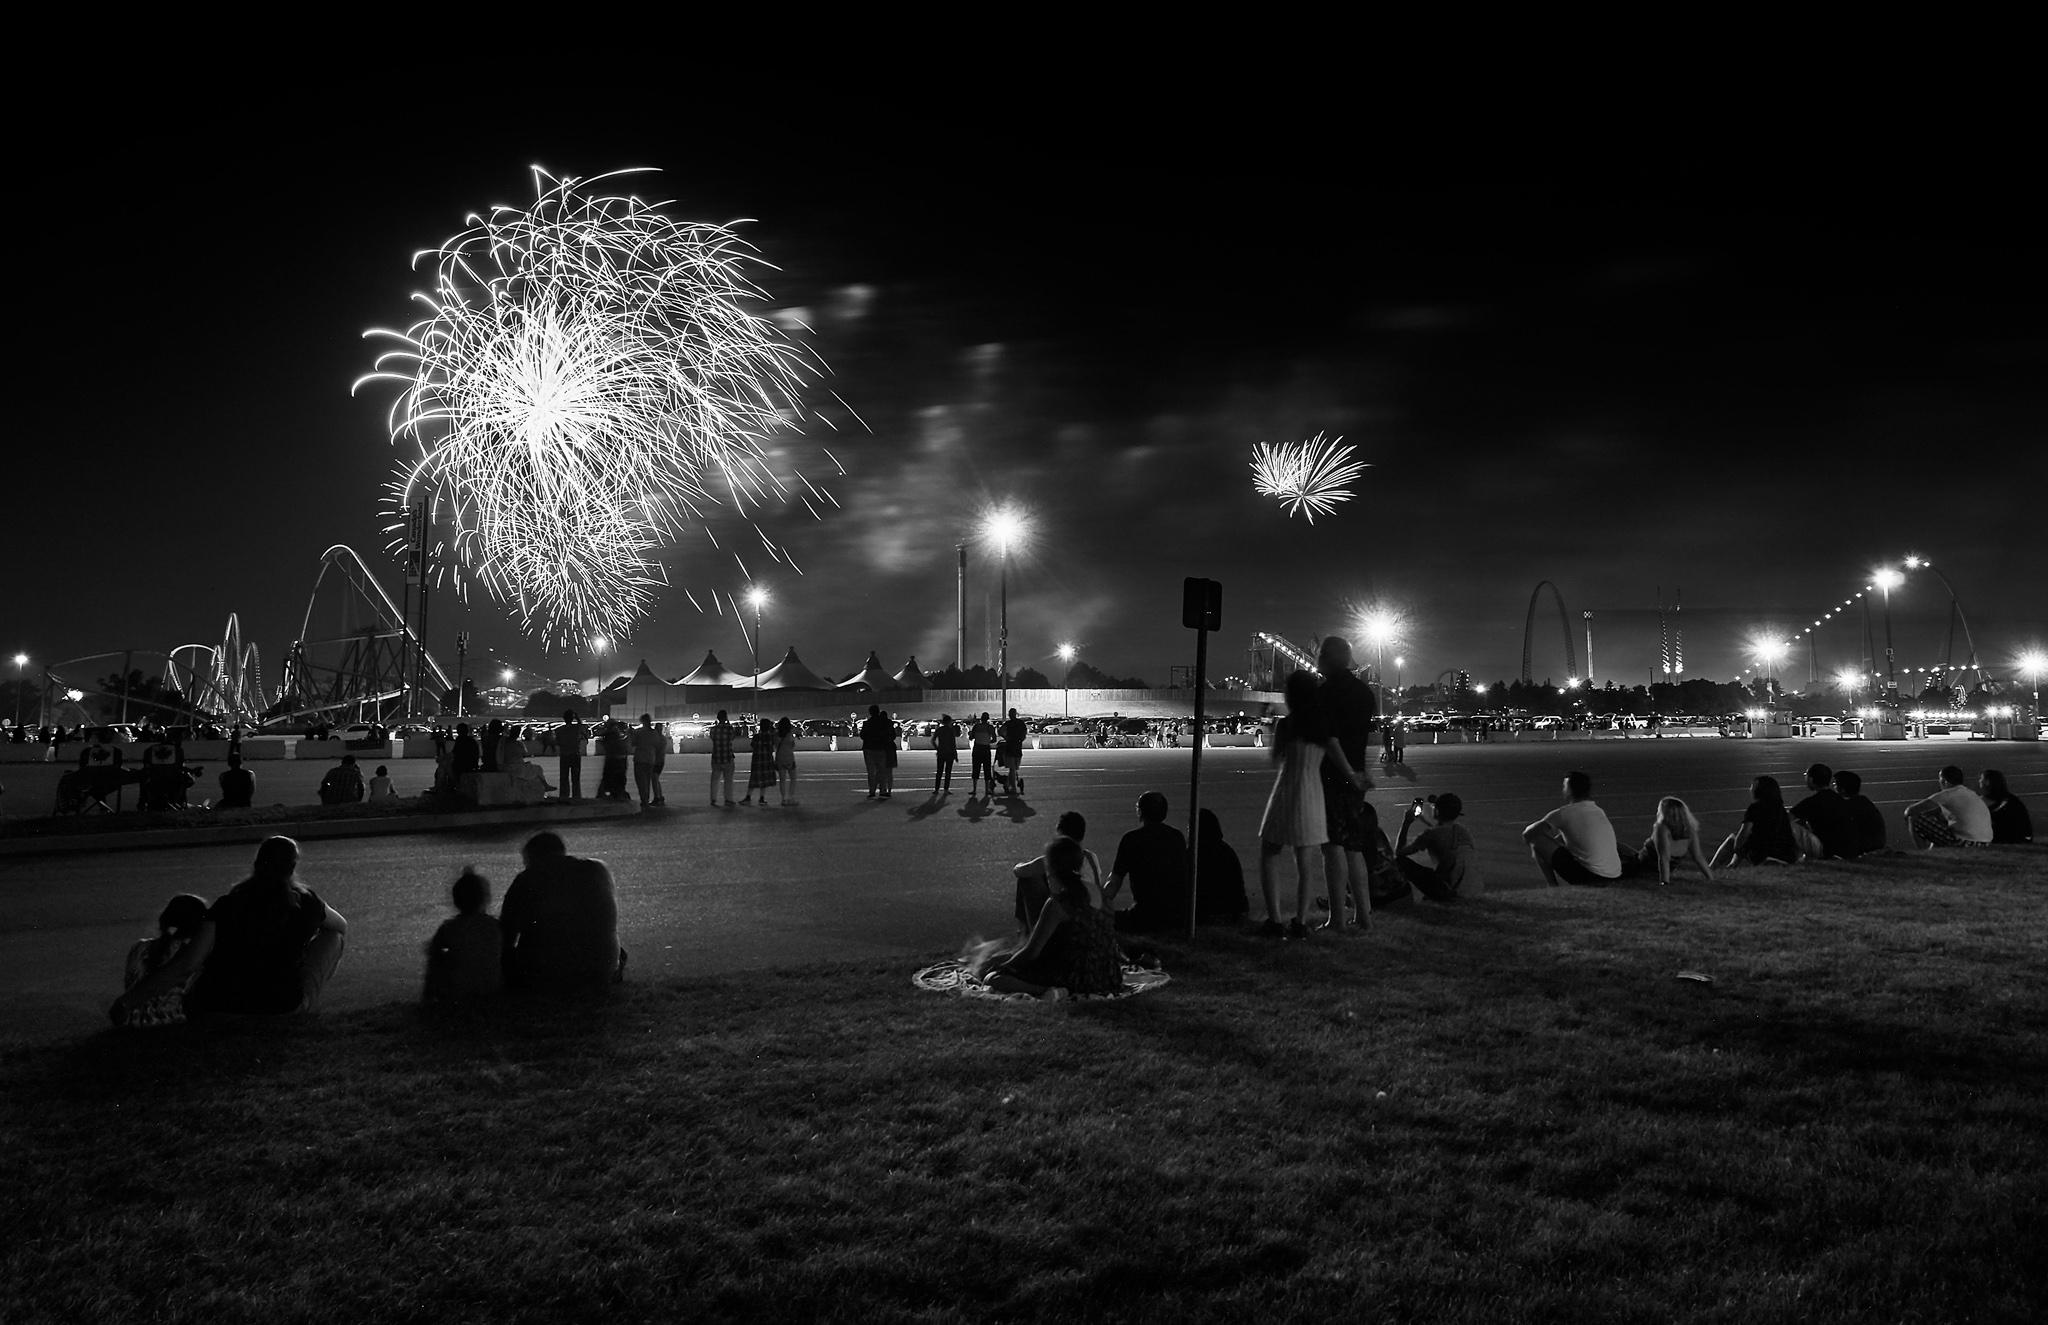 Canada-Day_2018_Wonderland_Fireworks_01bw.jpg